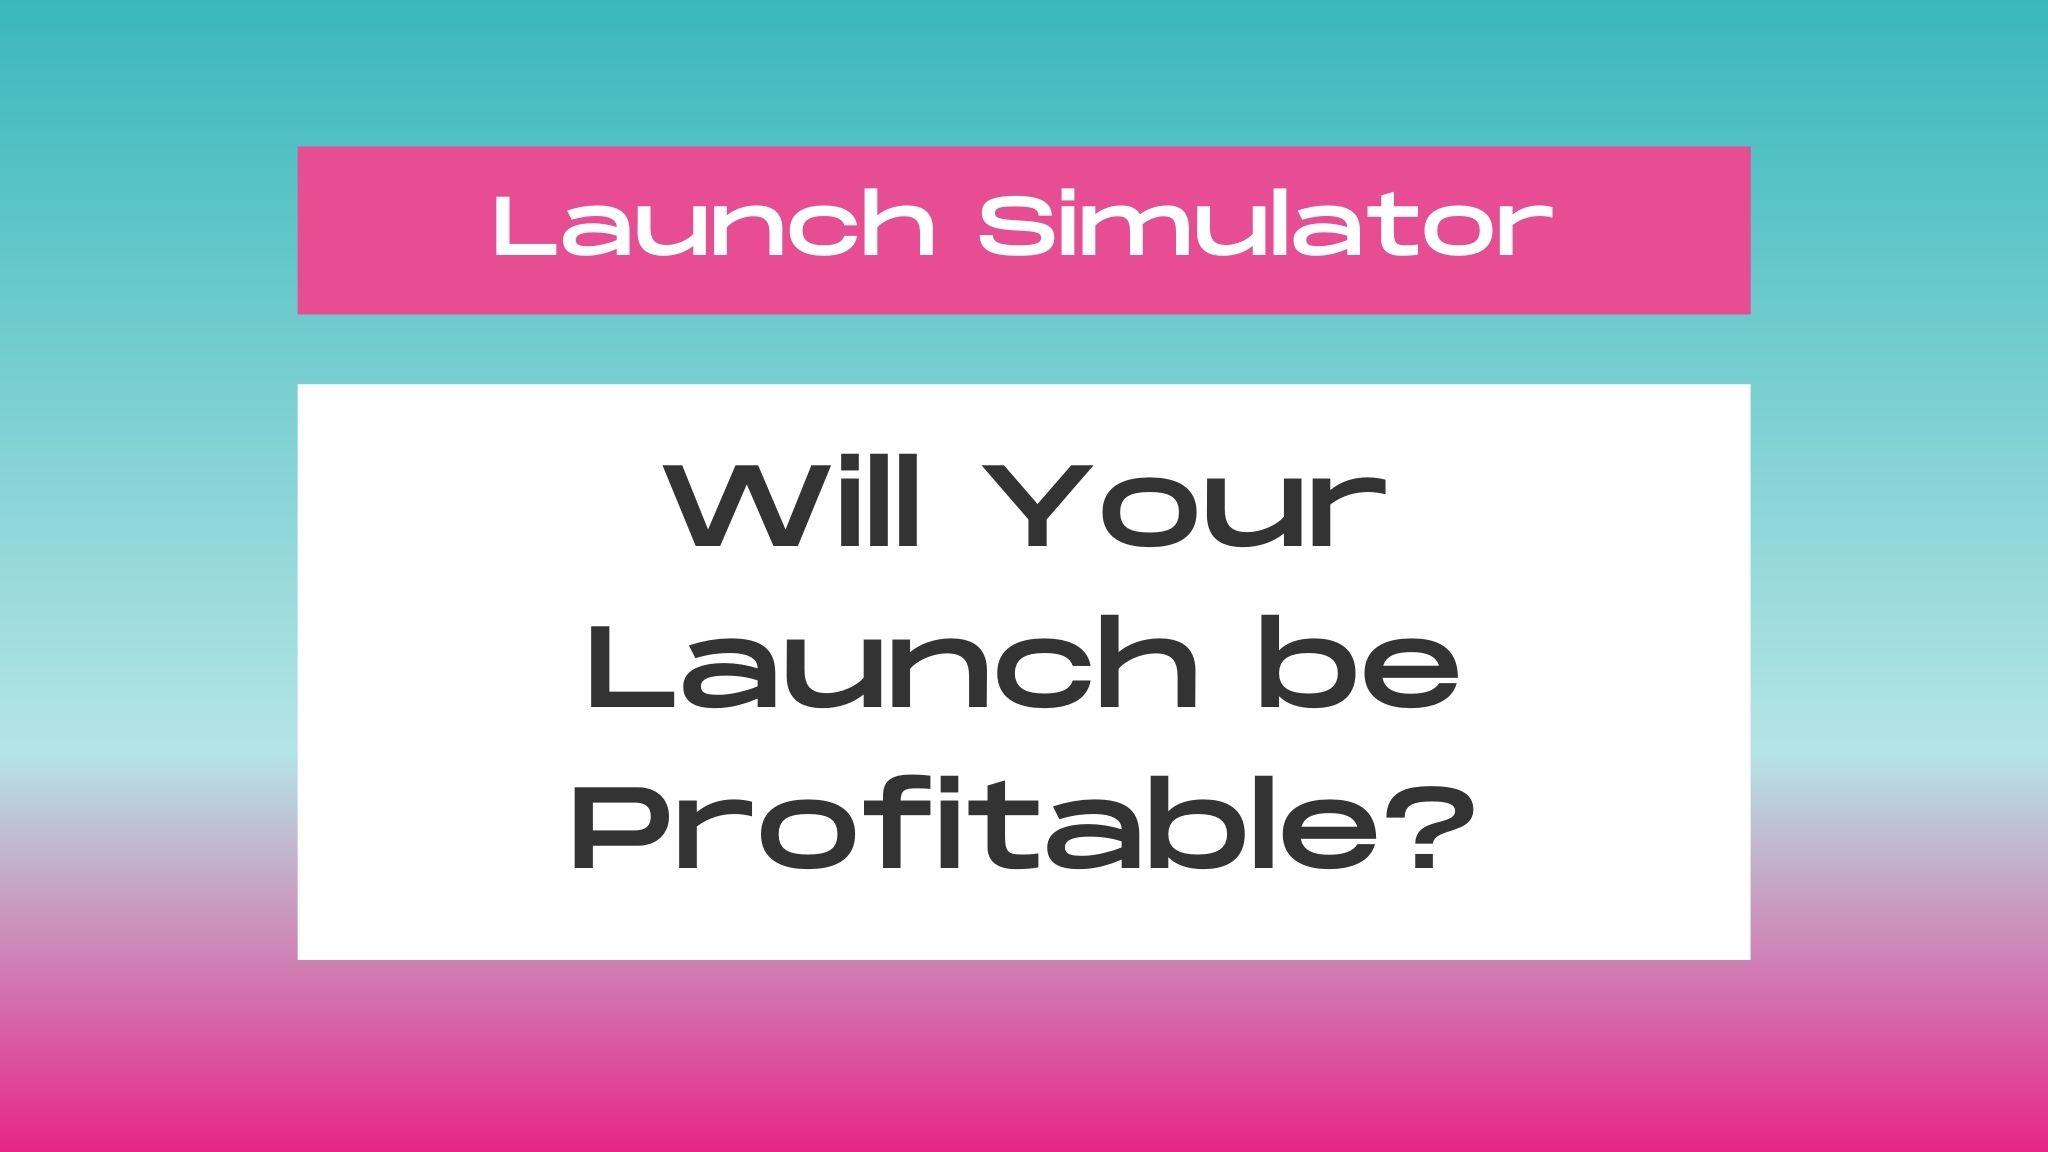 launch simulator will it be profitable